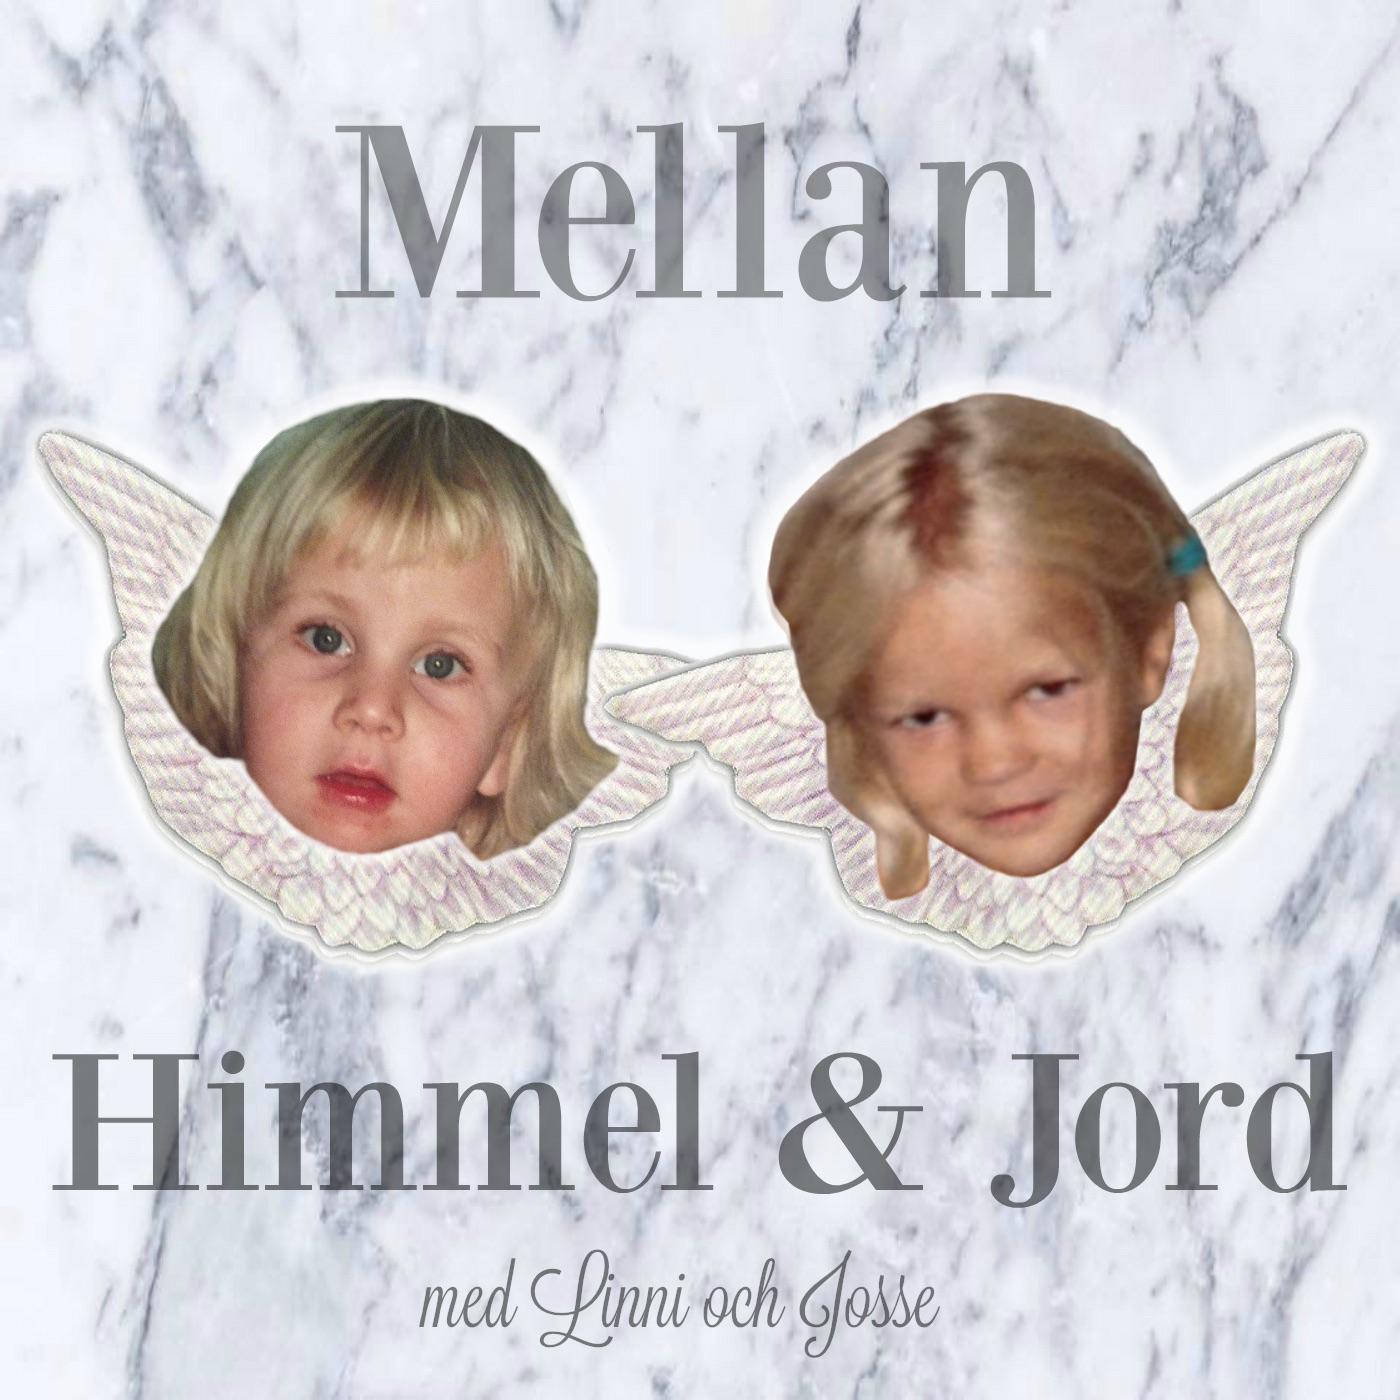 Mellan Himmel & Jord